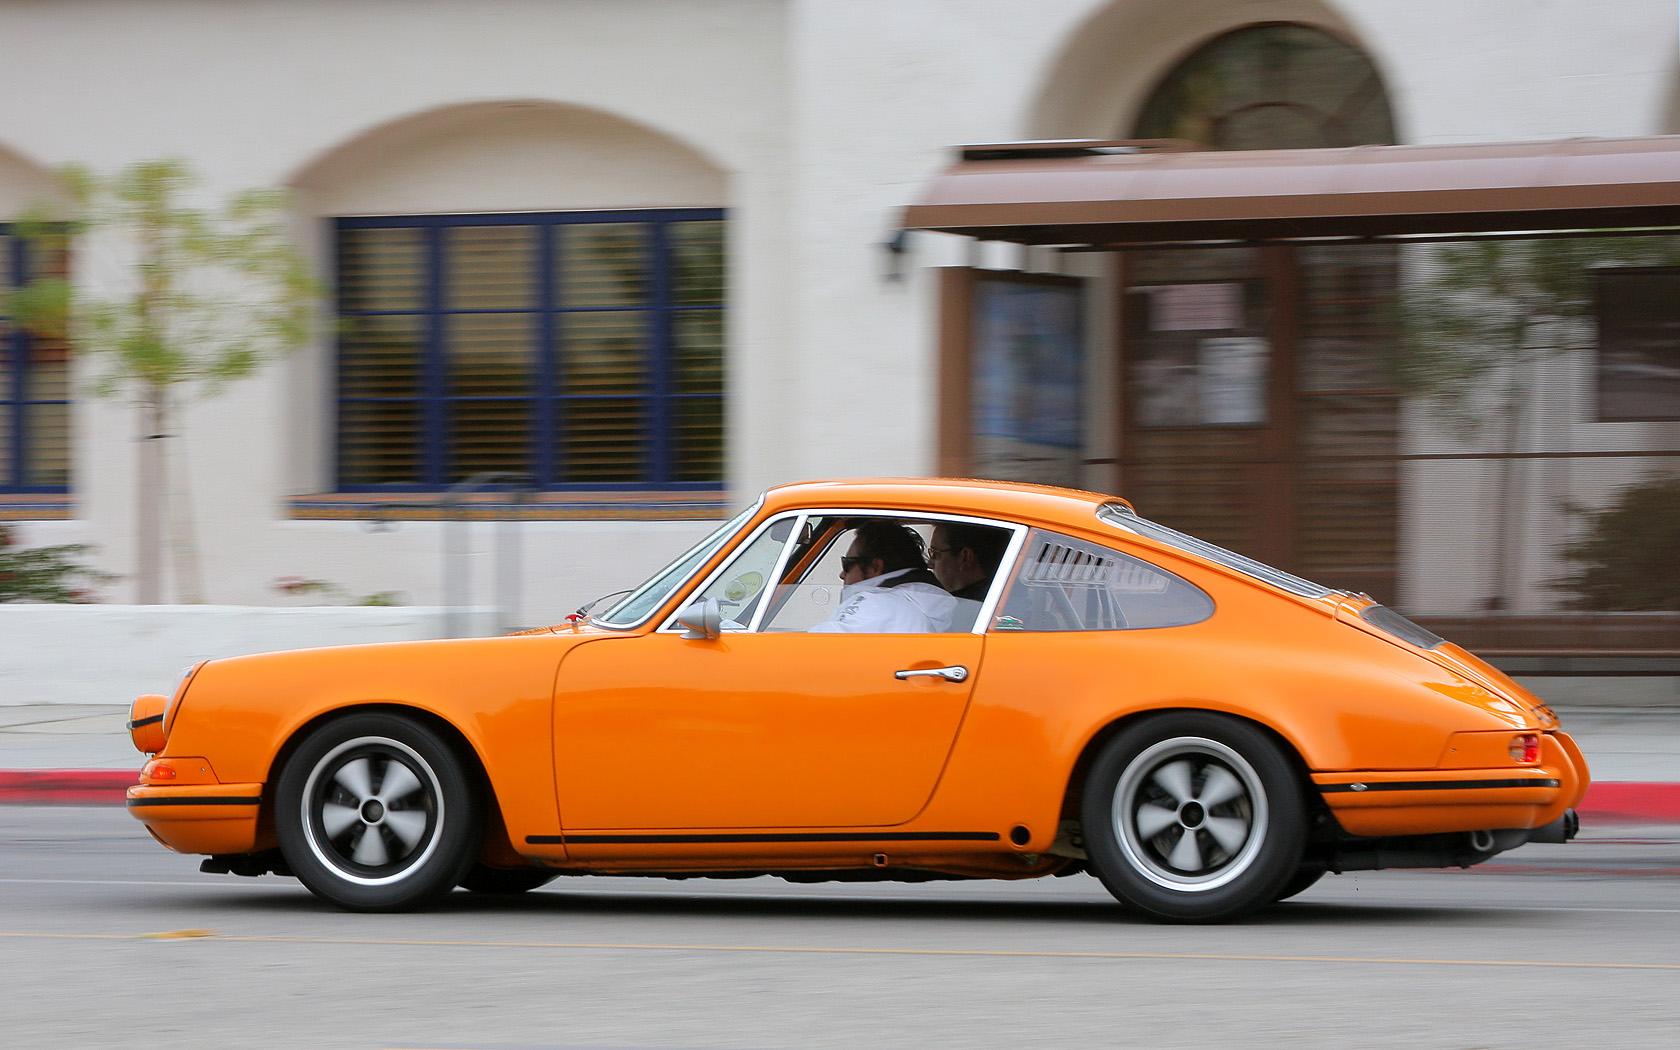 file 1969 porsche 911 2 litre chad mcqueen owner driver. Black Bedroom Furniture Sets. Home Design Ideas